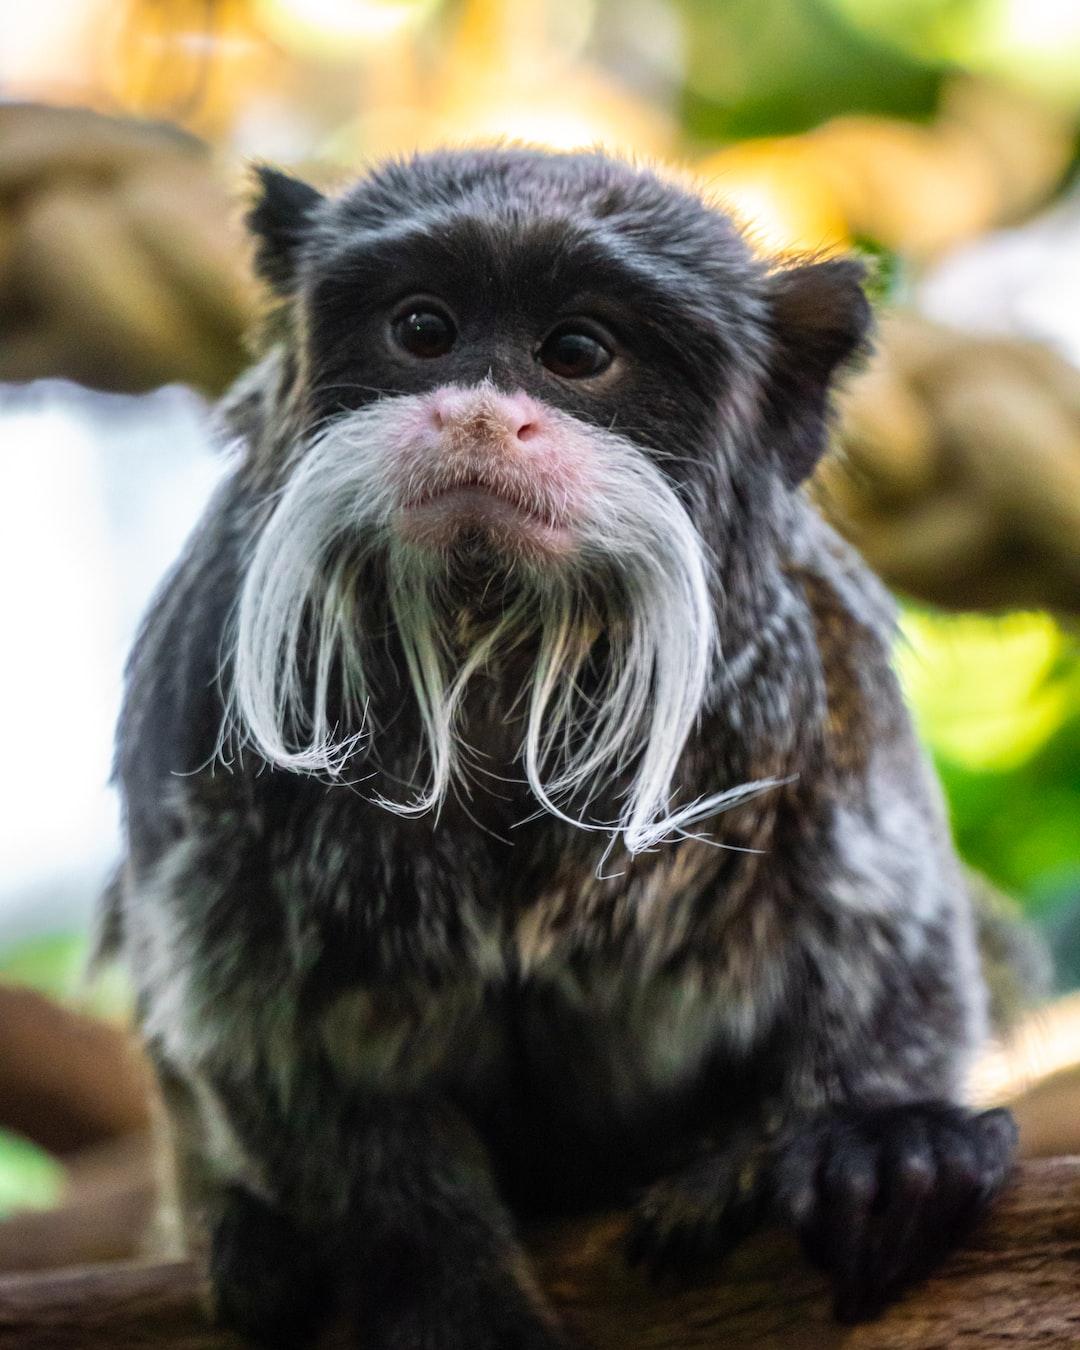 Monkey at Berlin Zoo